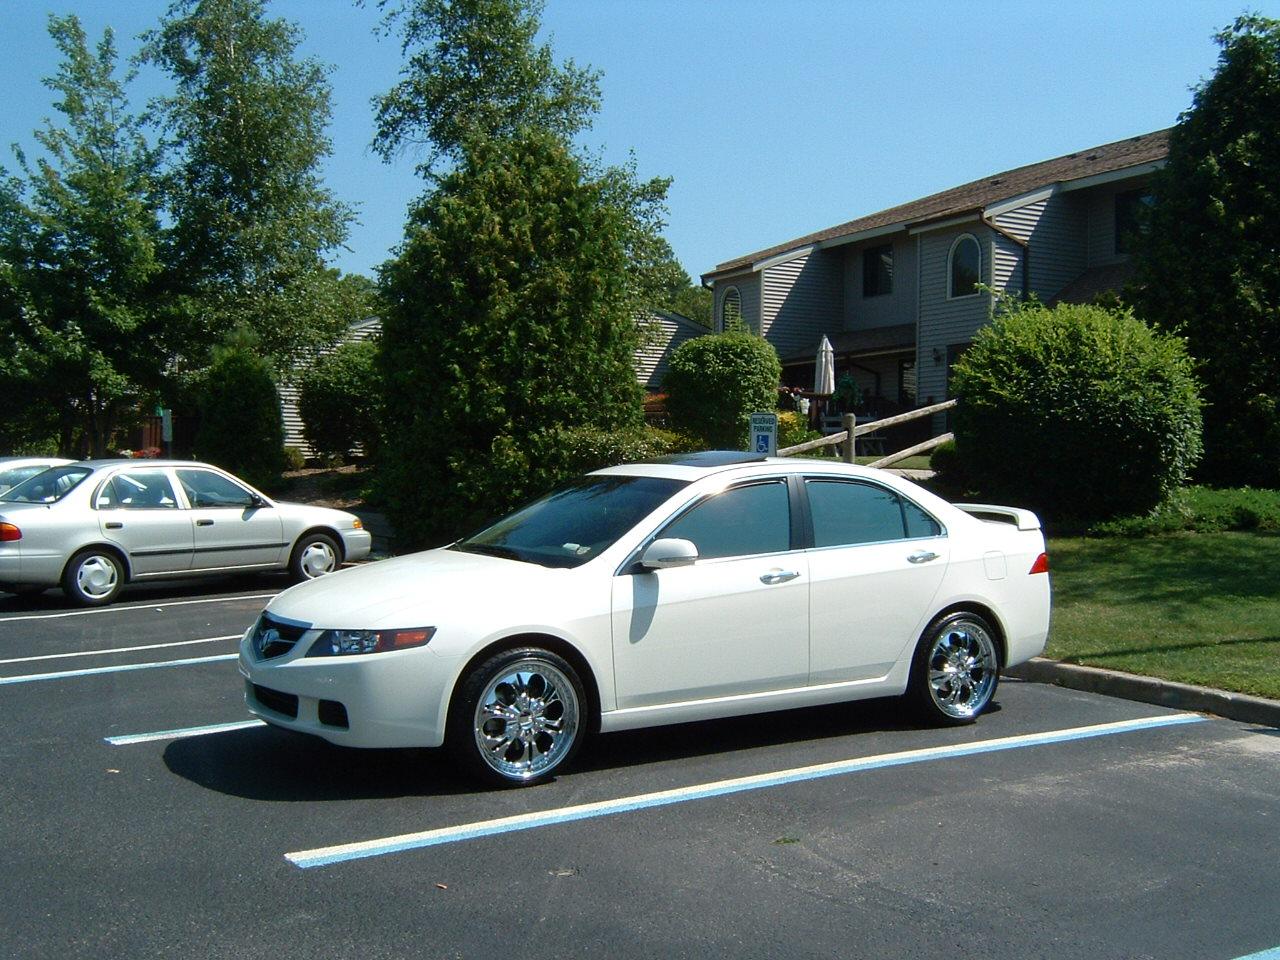 2004 Acura TSX She's Beautiful